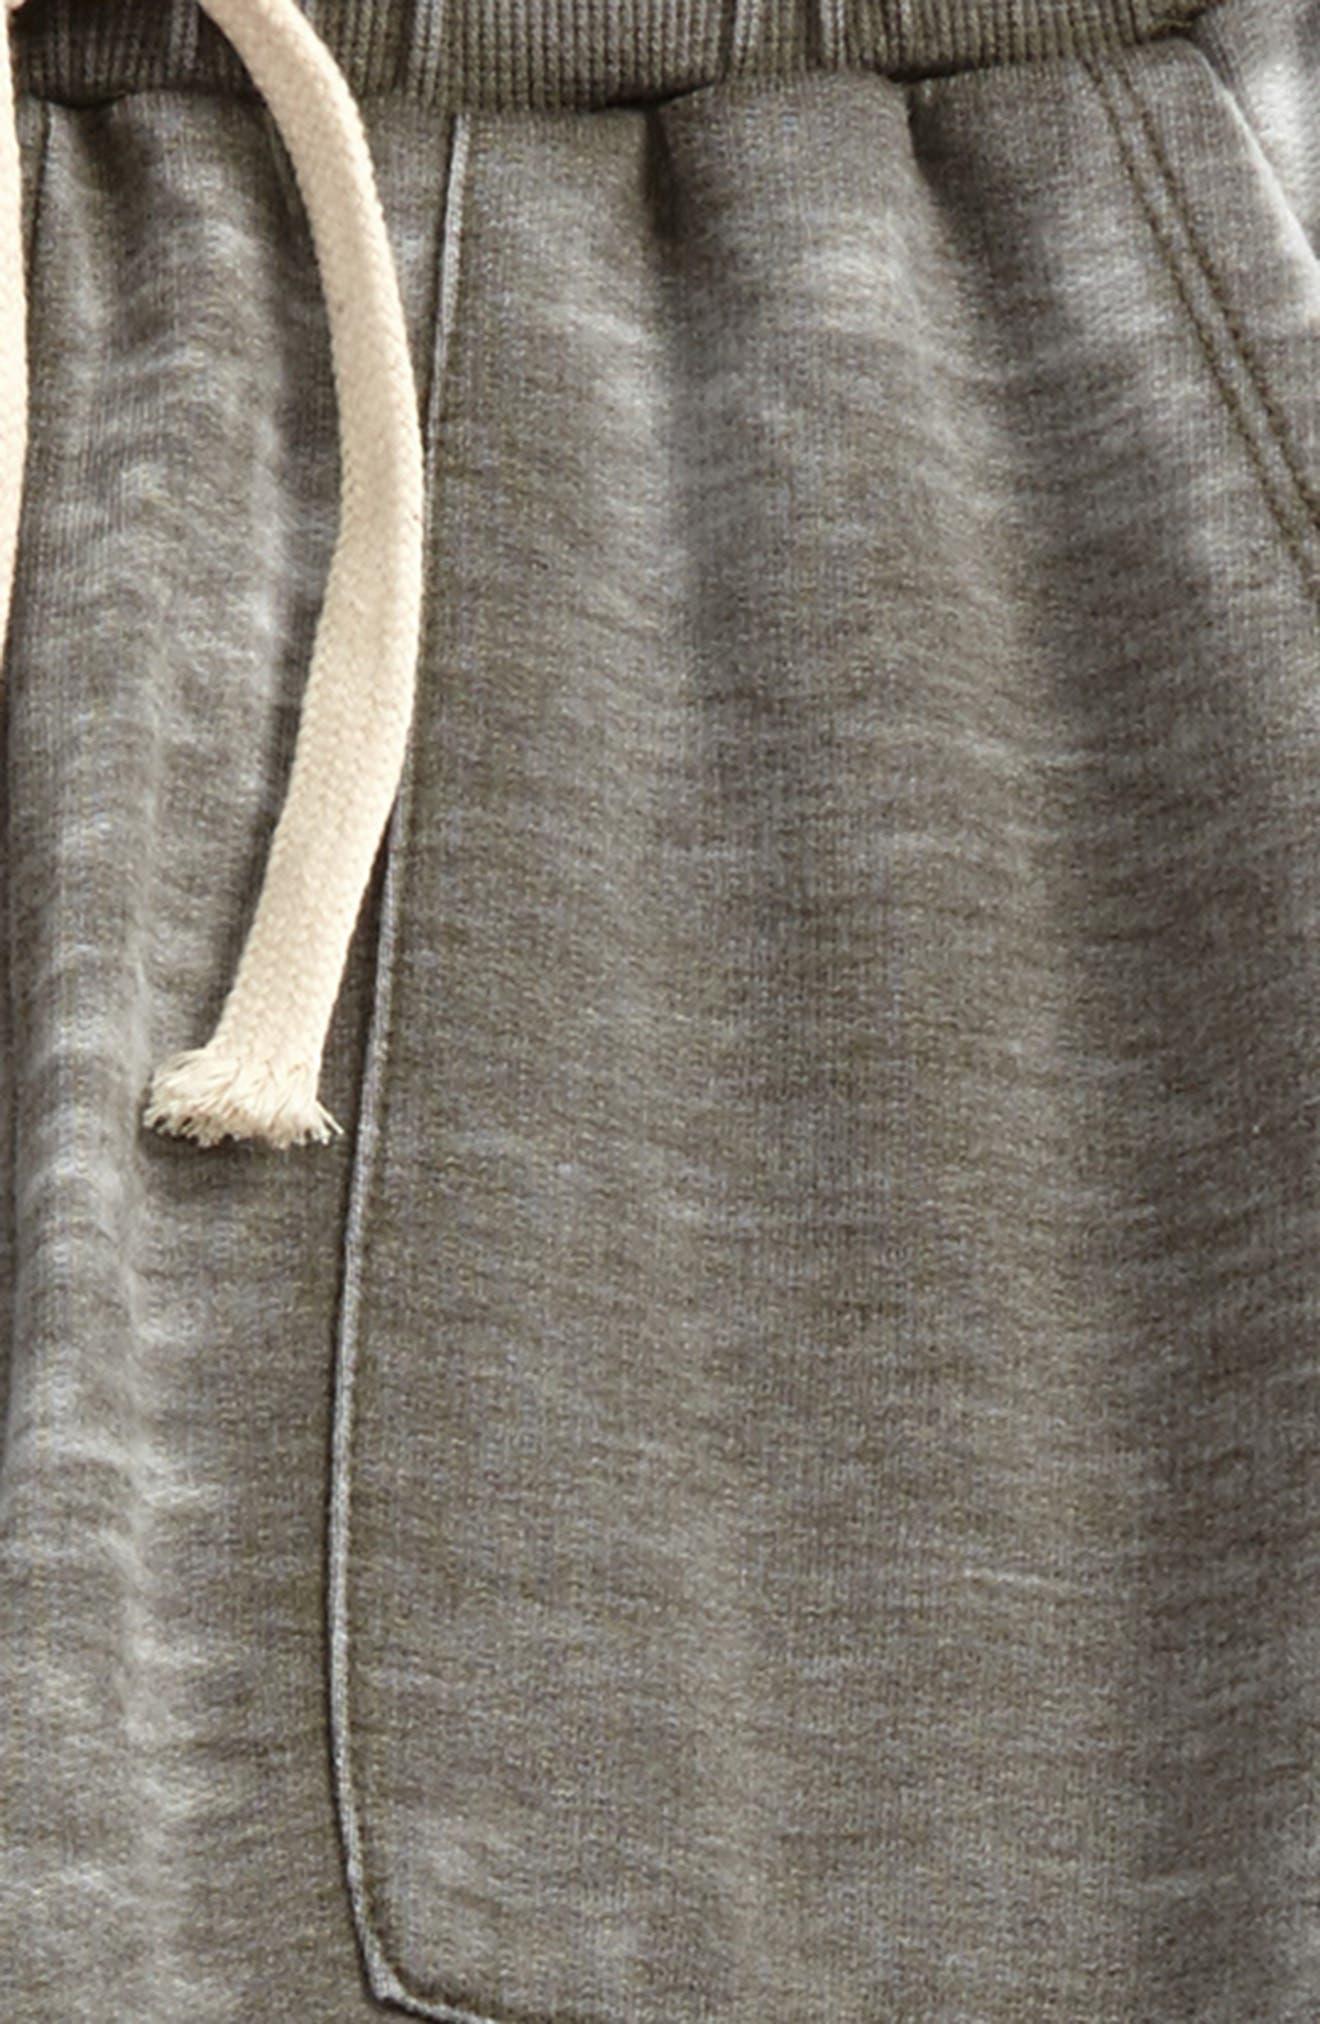 Distressed Sweatpants,                             Alternate thumbnail 2, color,                             Olive